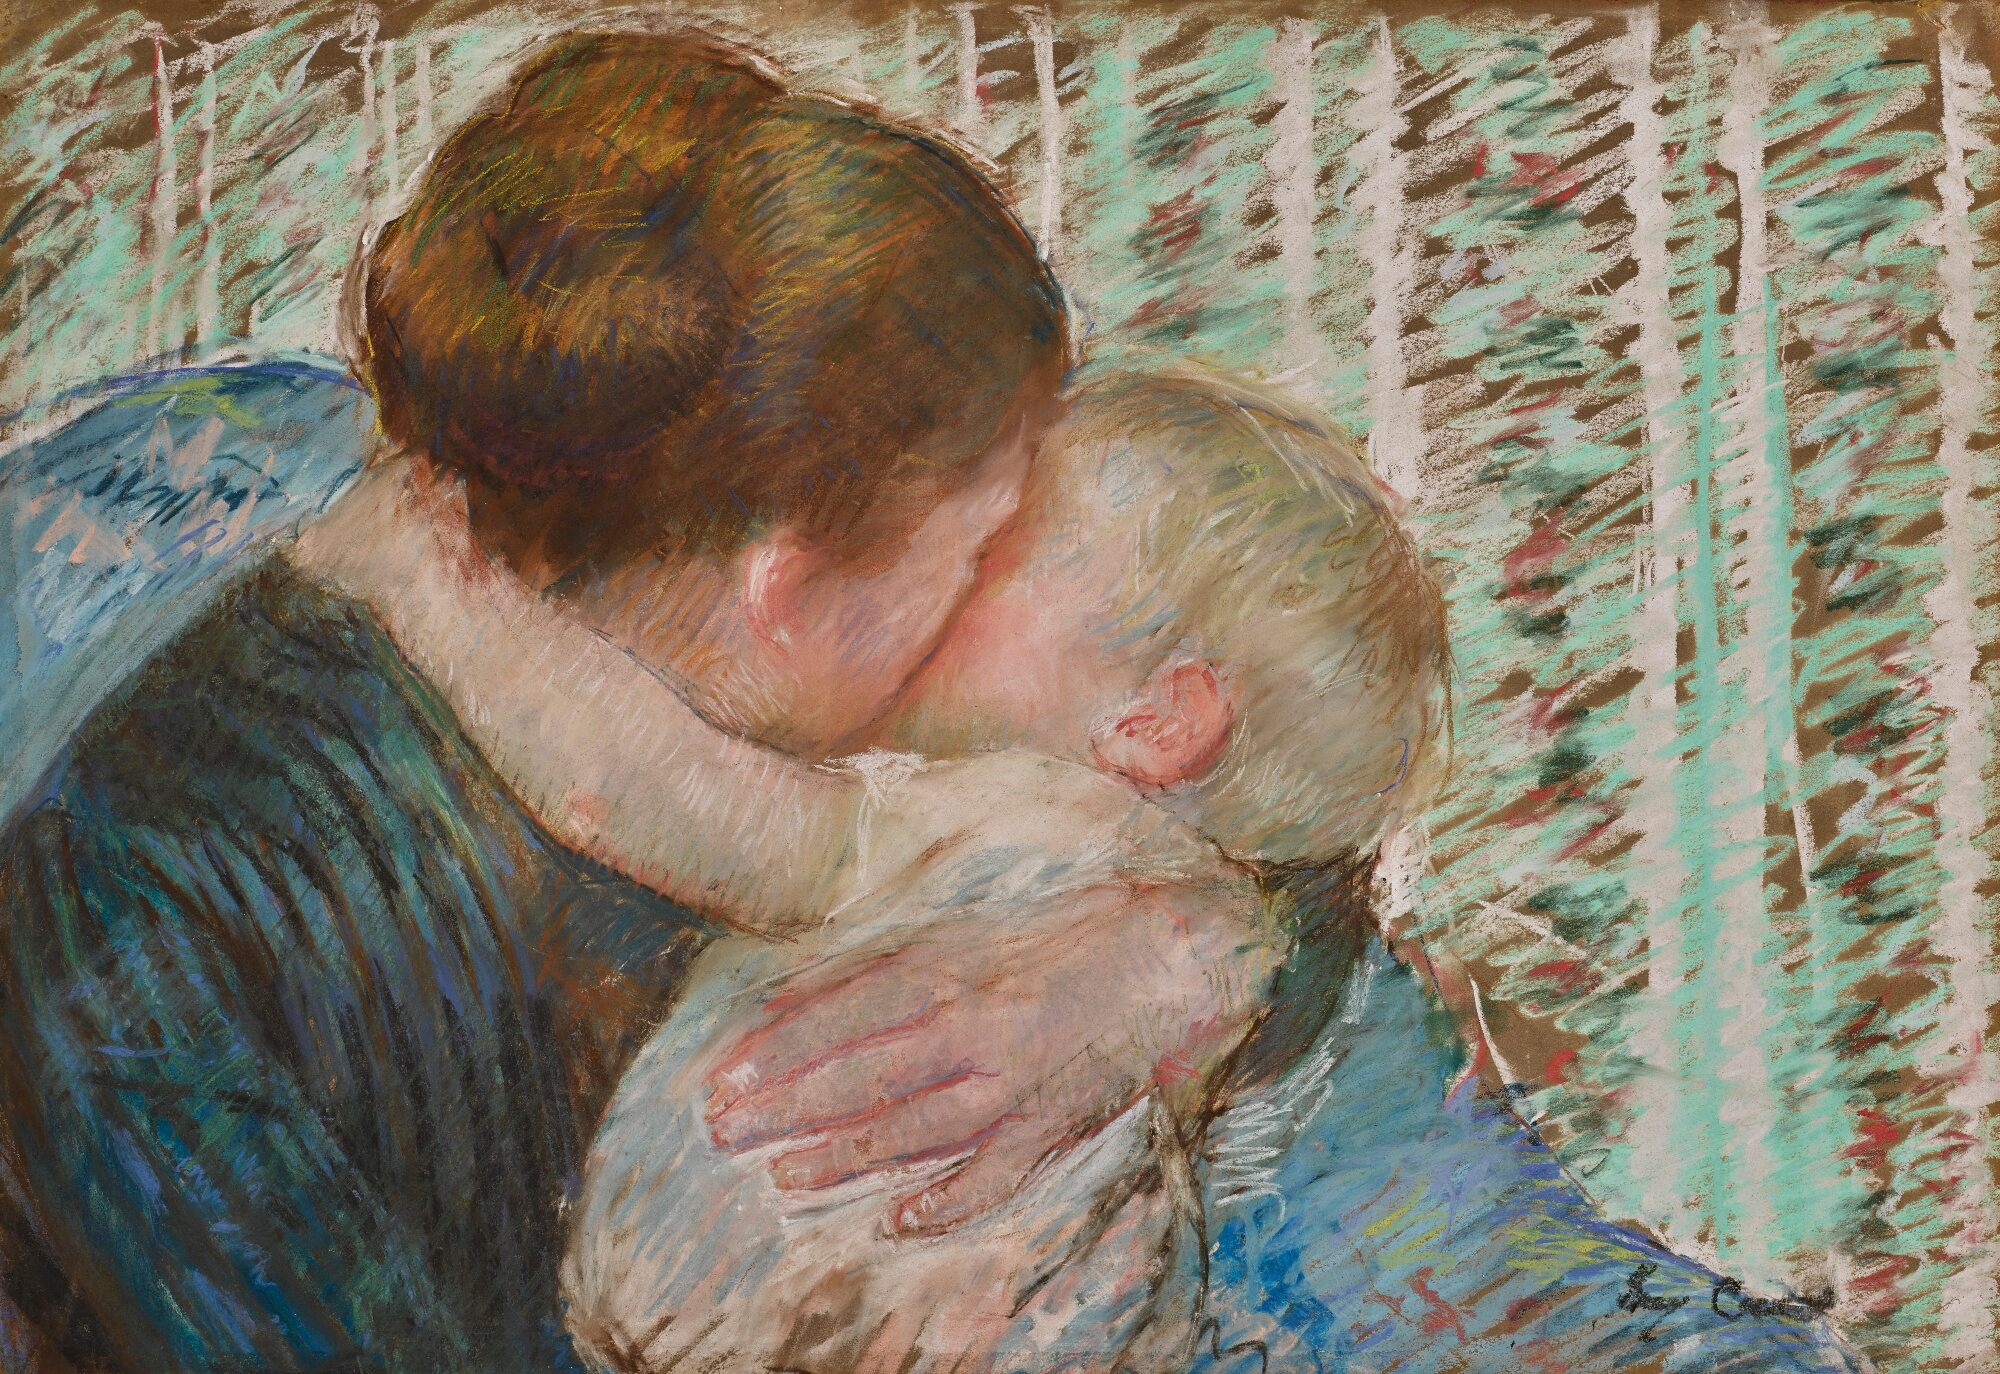 File:Mary Cassatt - Mother and Child (The Goodnight Hug).jpg